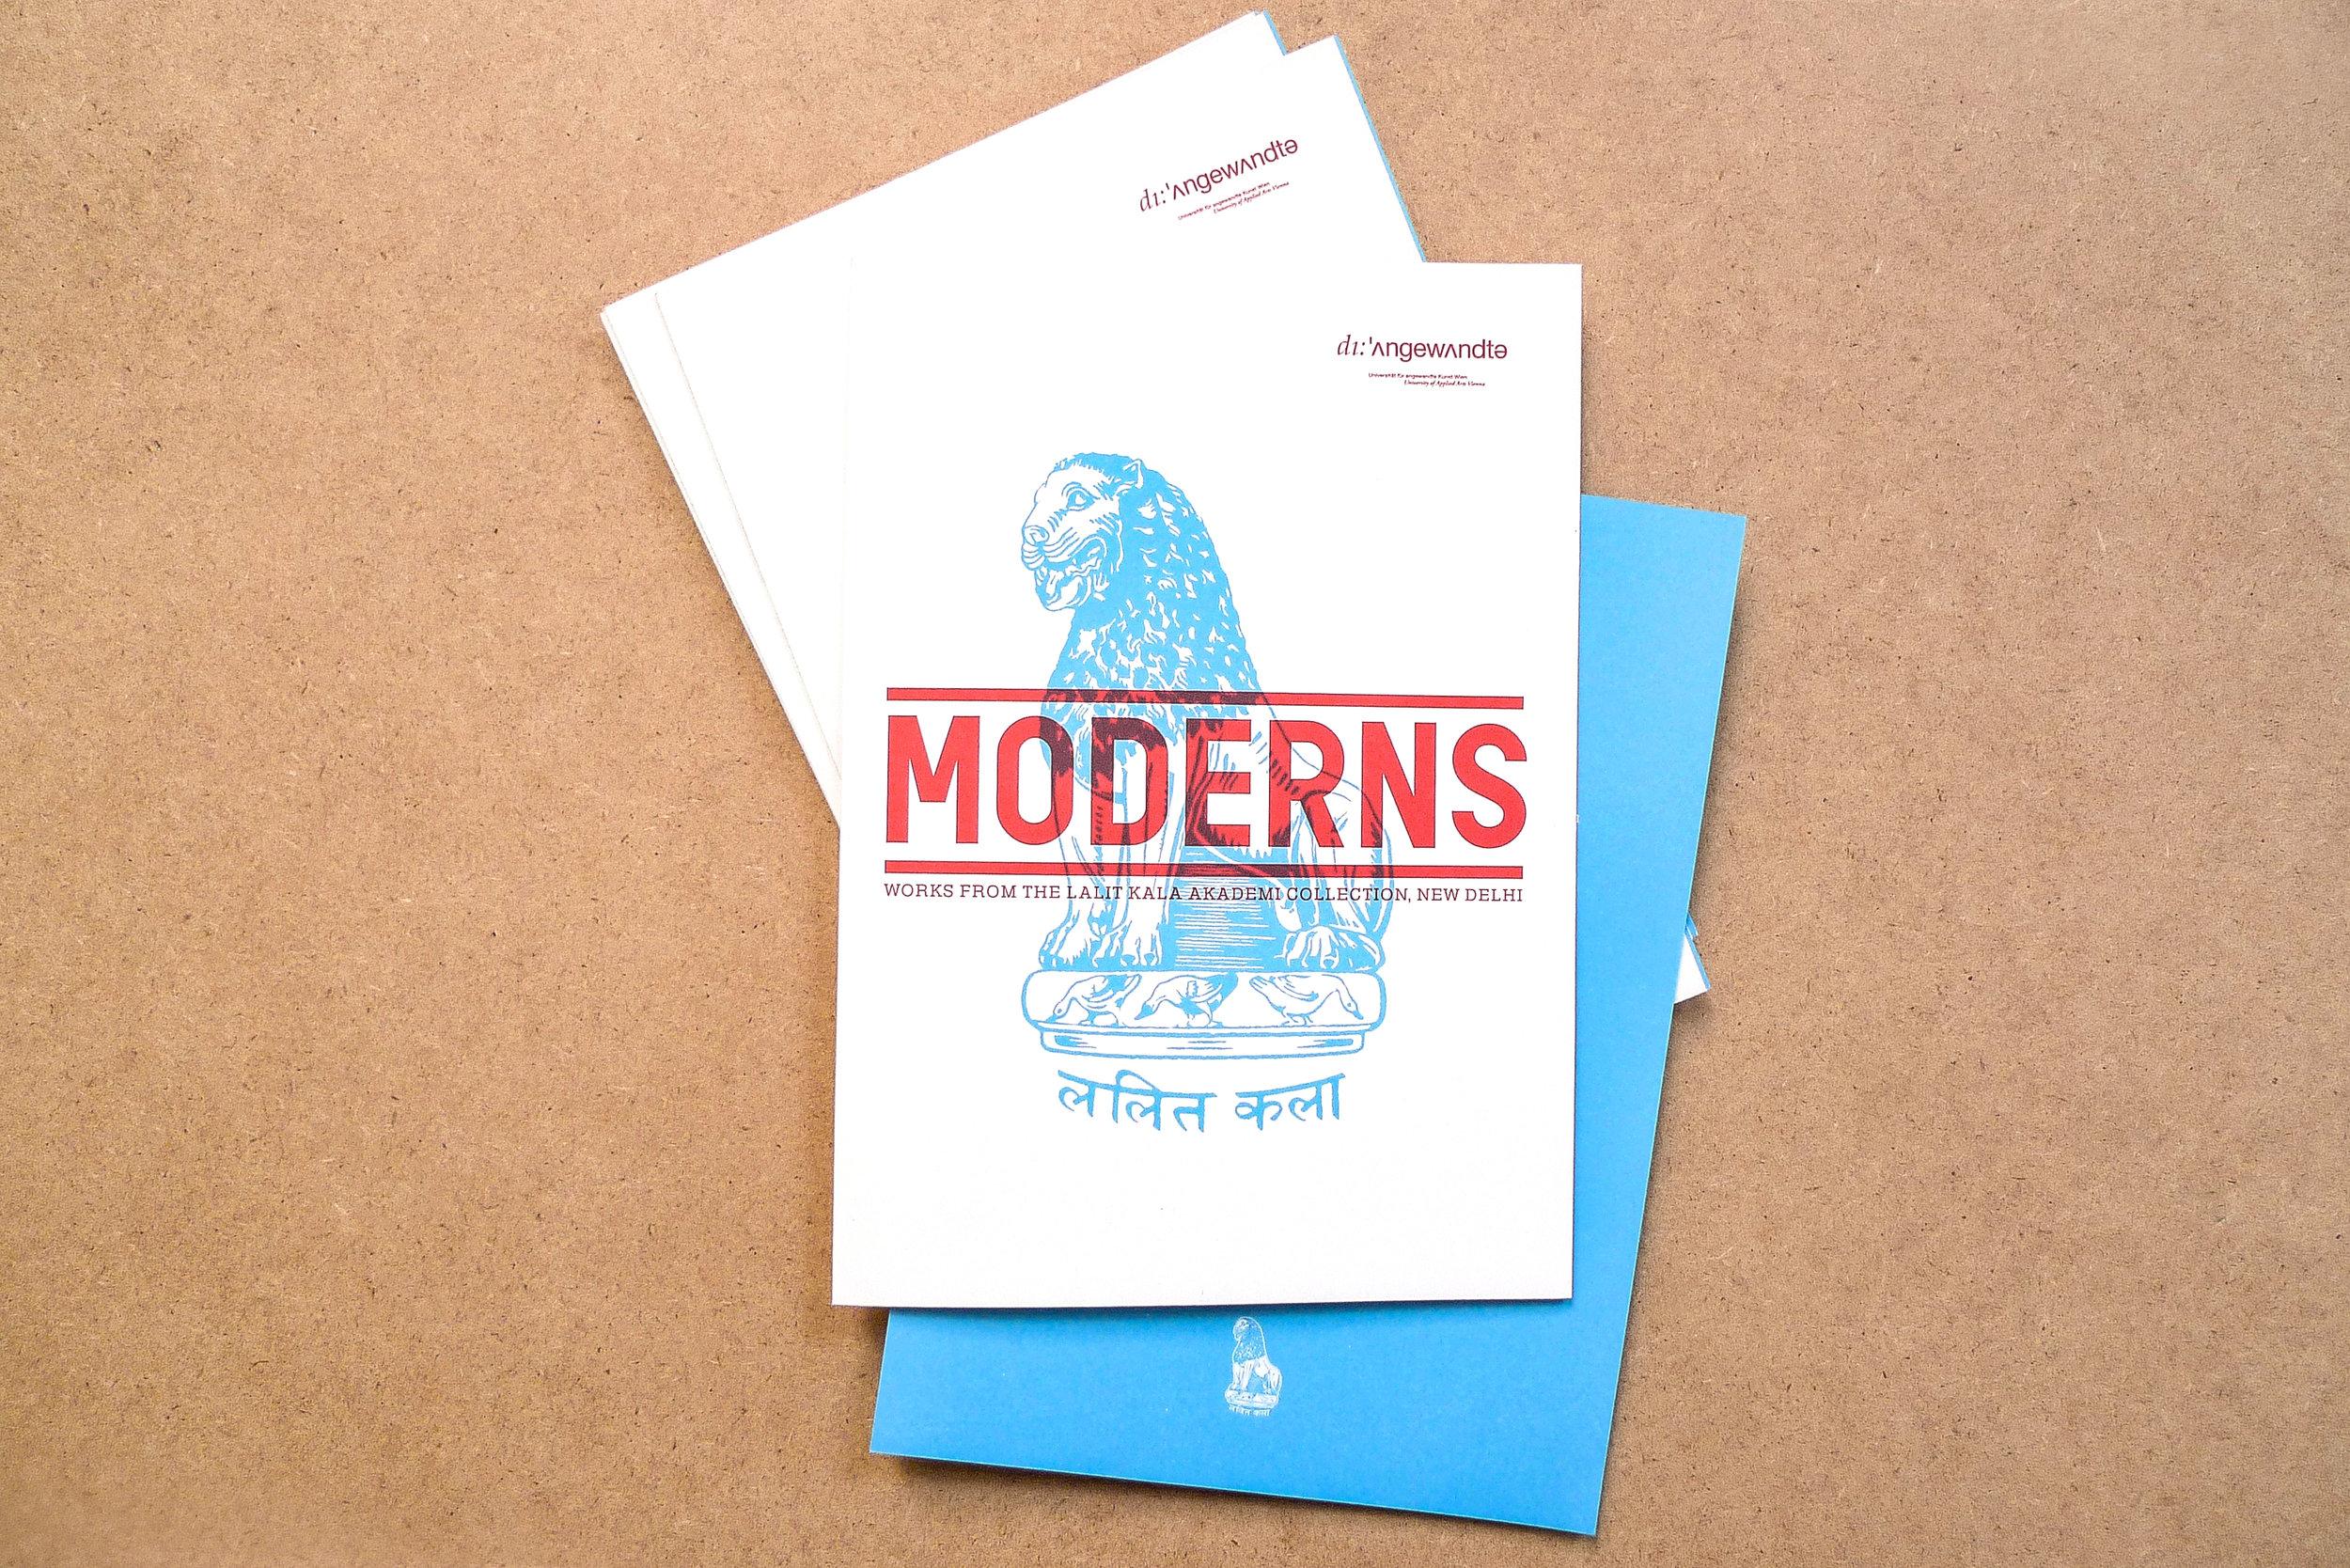 moderns_1-2.jpg